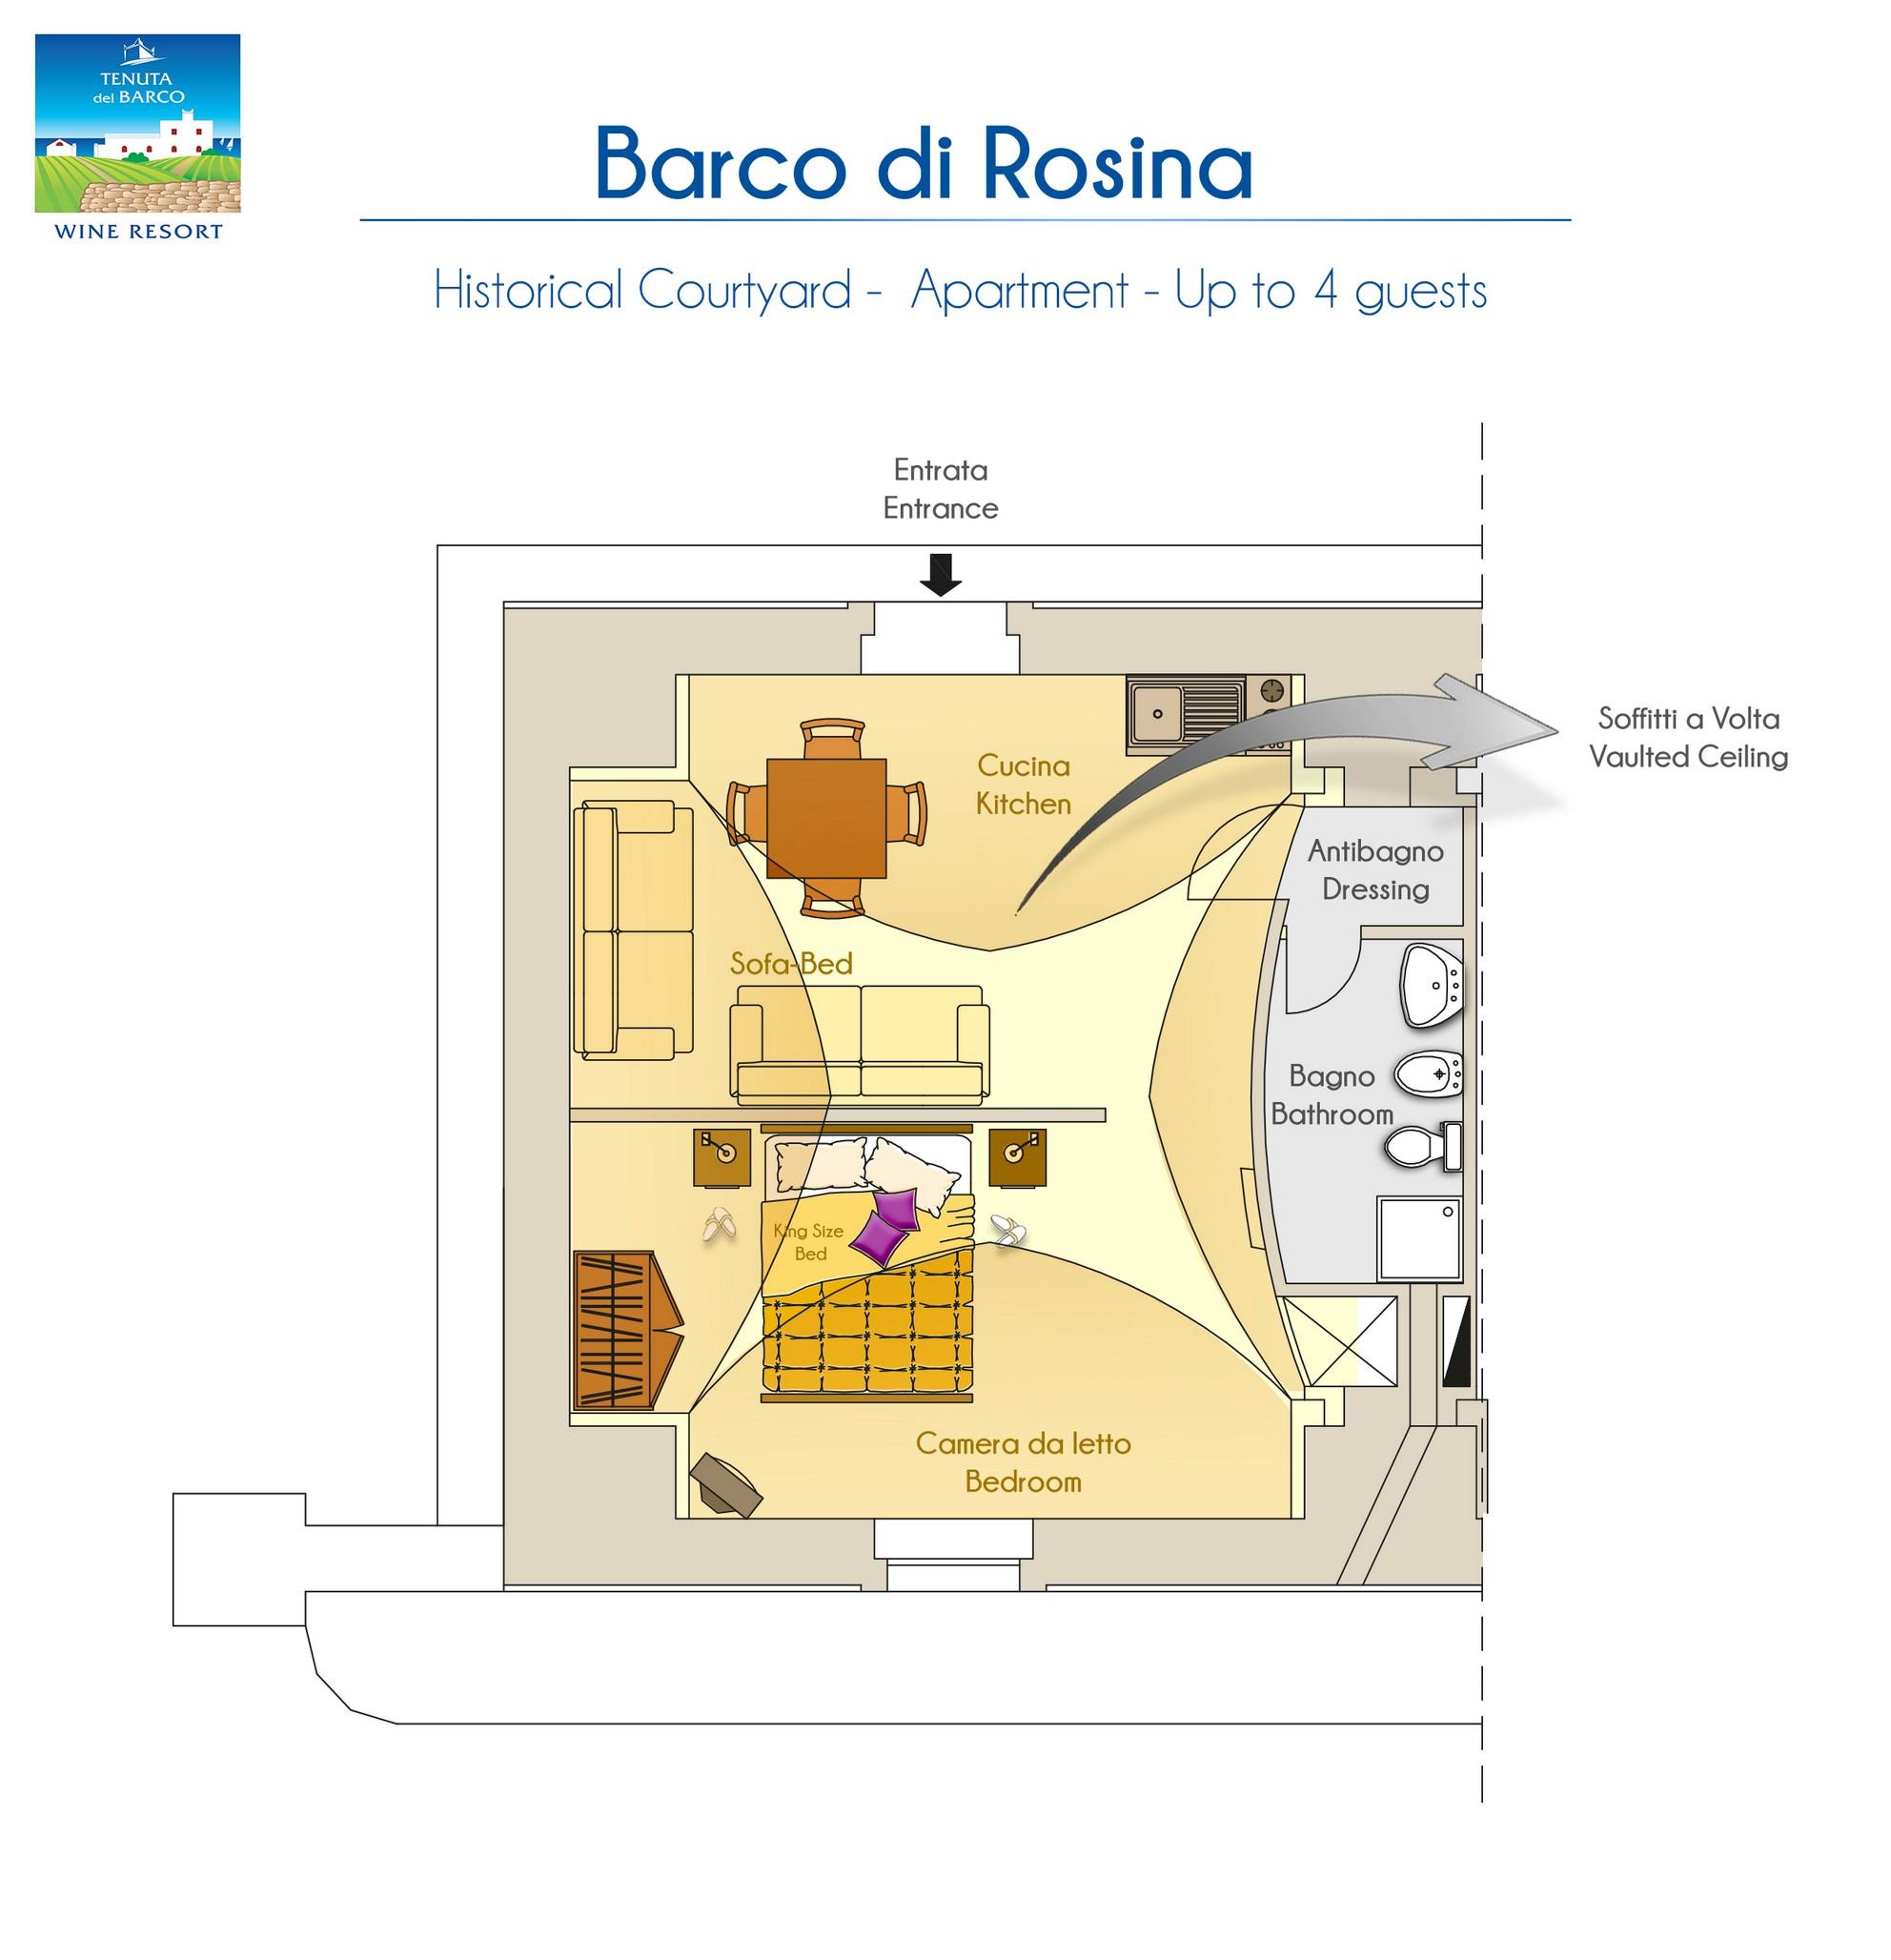 Barco di Rosina